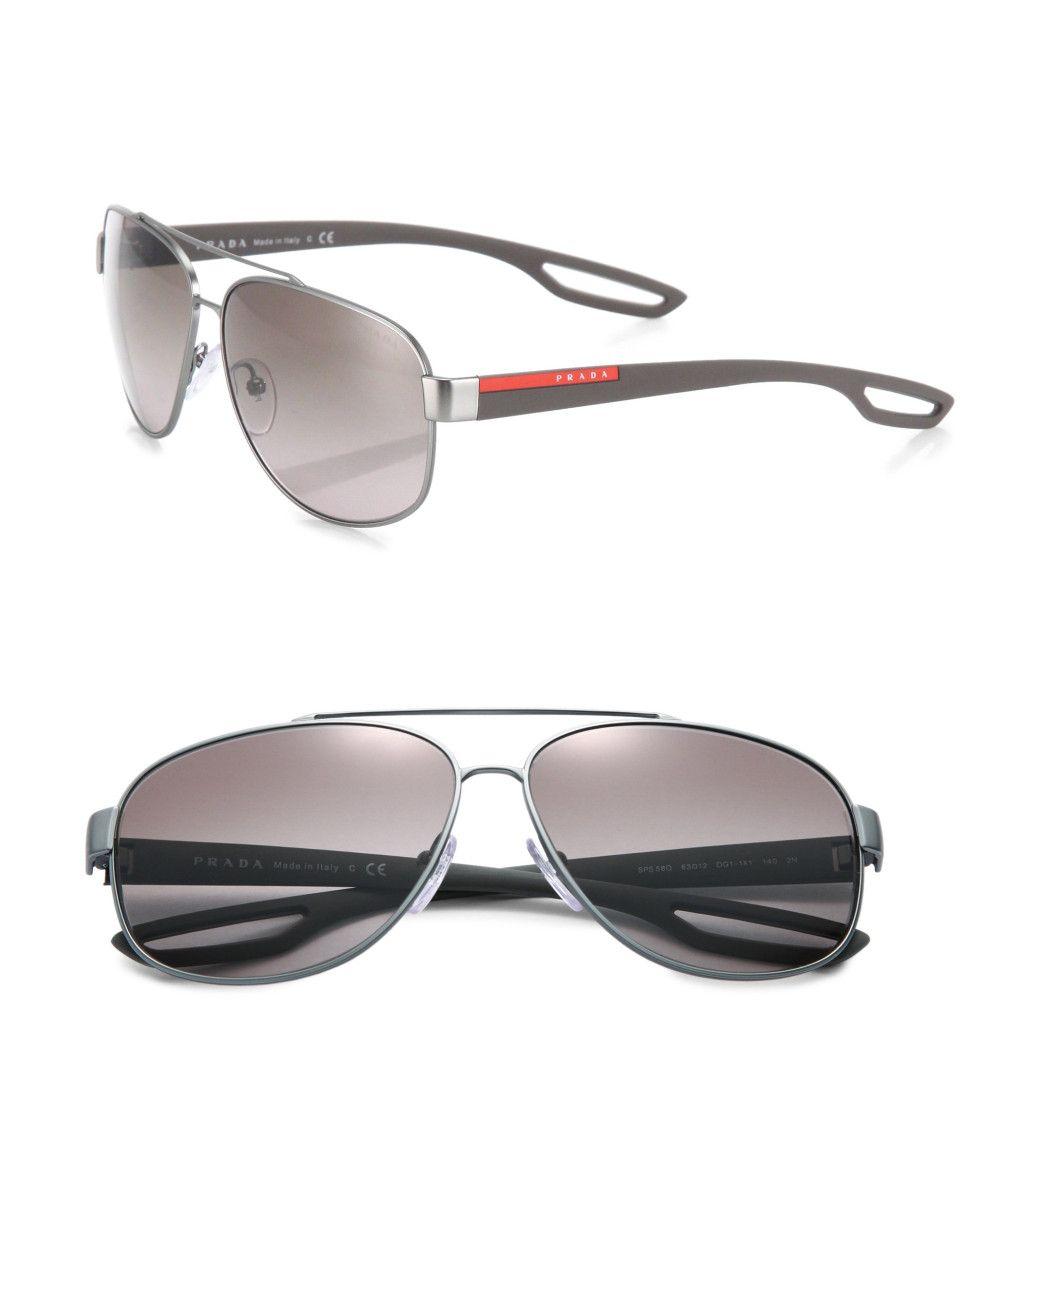 47c9f9bc76c9 Men's Metallic 63mm Rectangle Sunglasses | SUNGLASSES | Rectangle ...